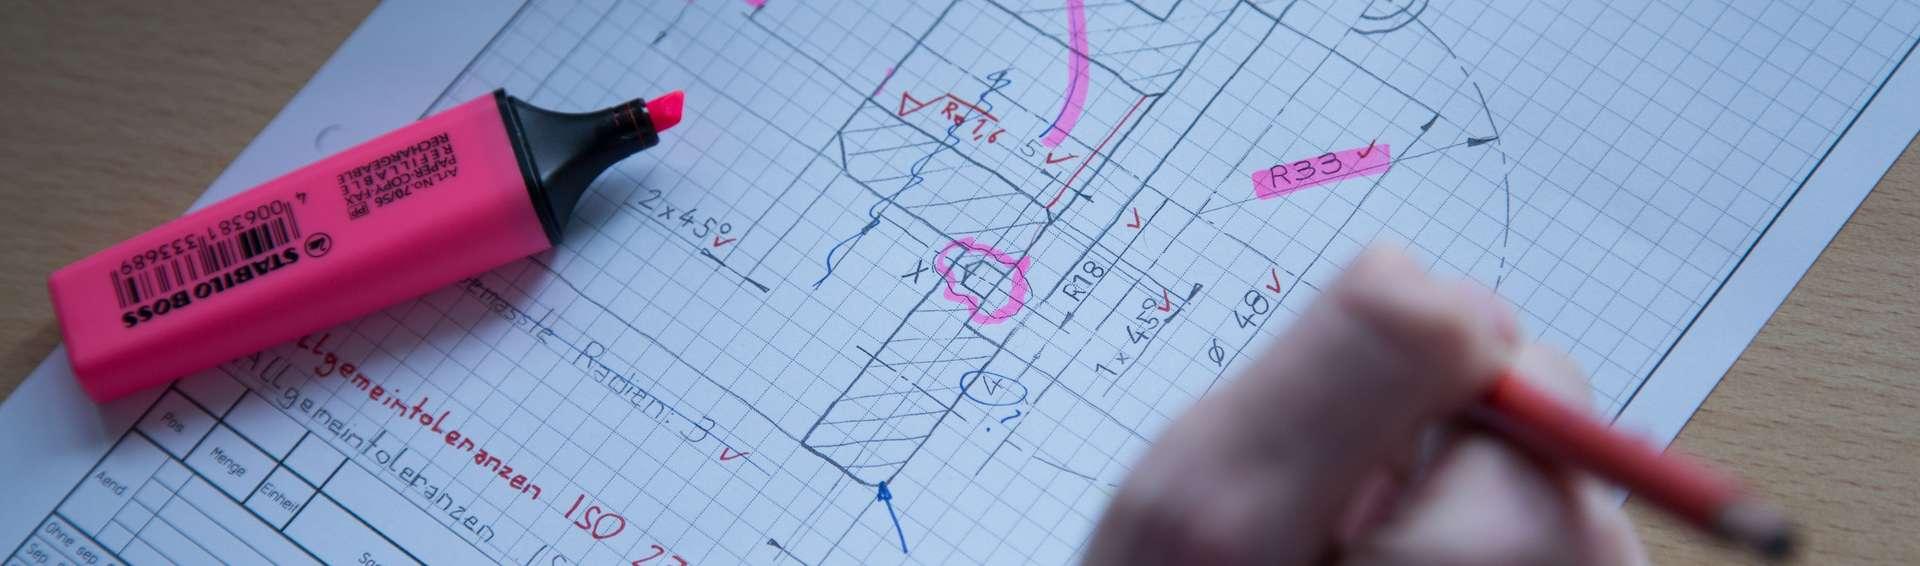 Konstrukteur/in EFZ: Schnupperlehre